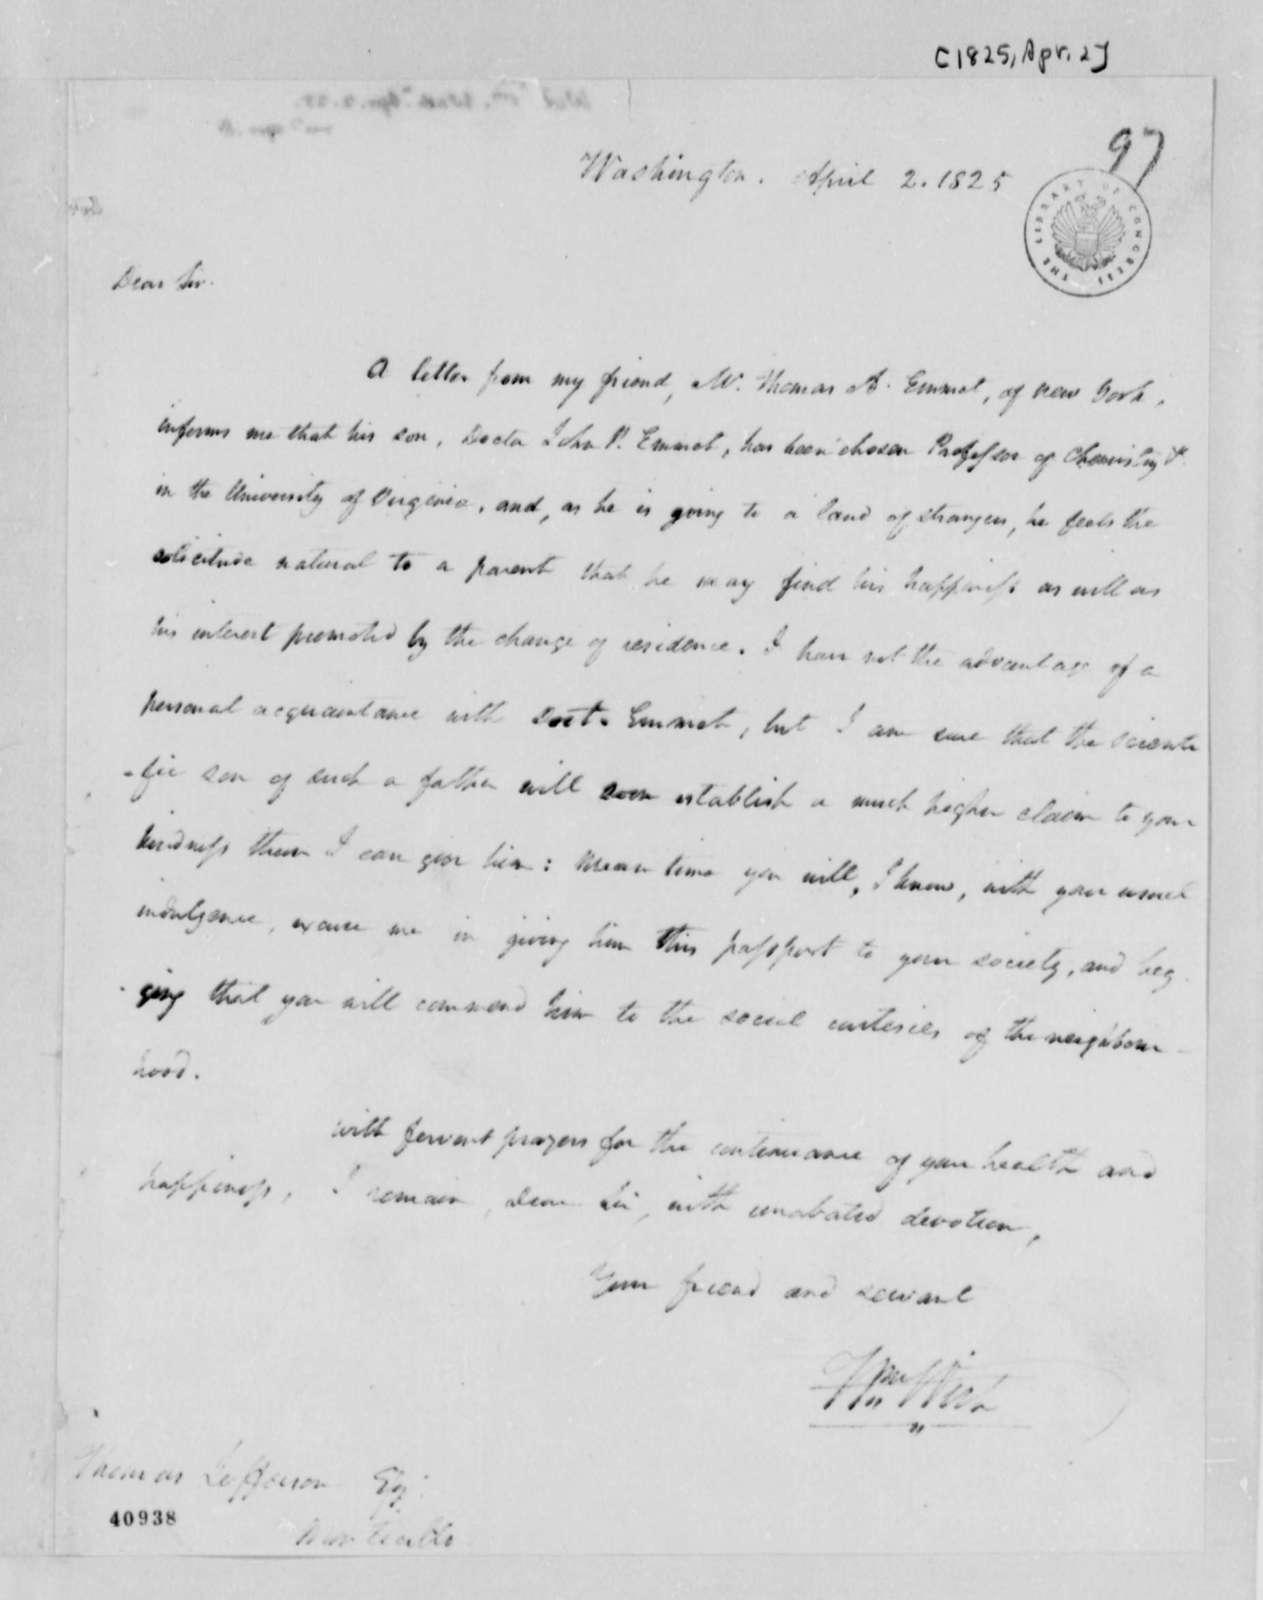 William Wirt to Thomas Jefferson, April 2, 1825